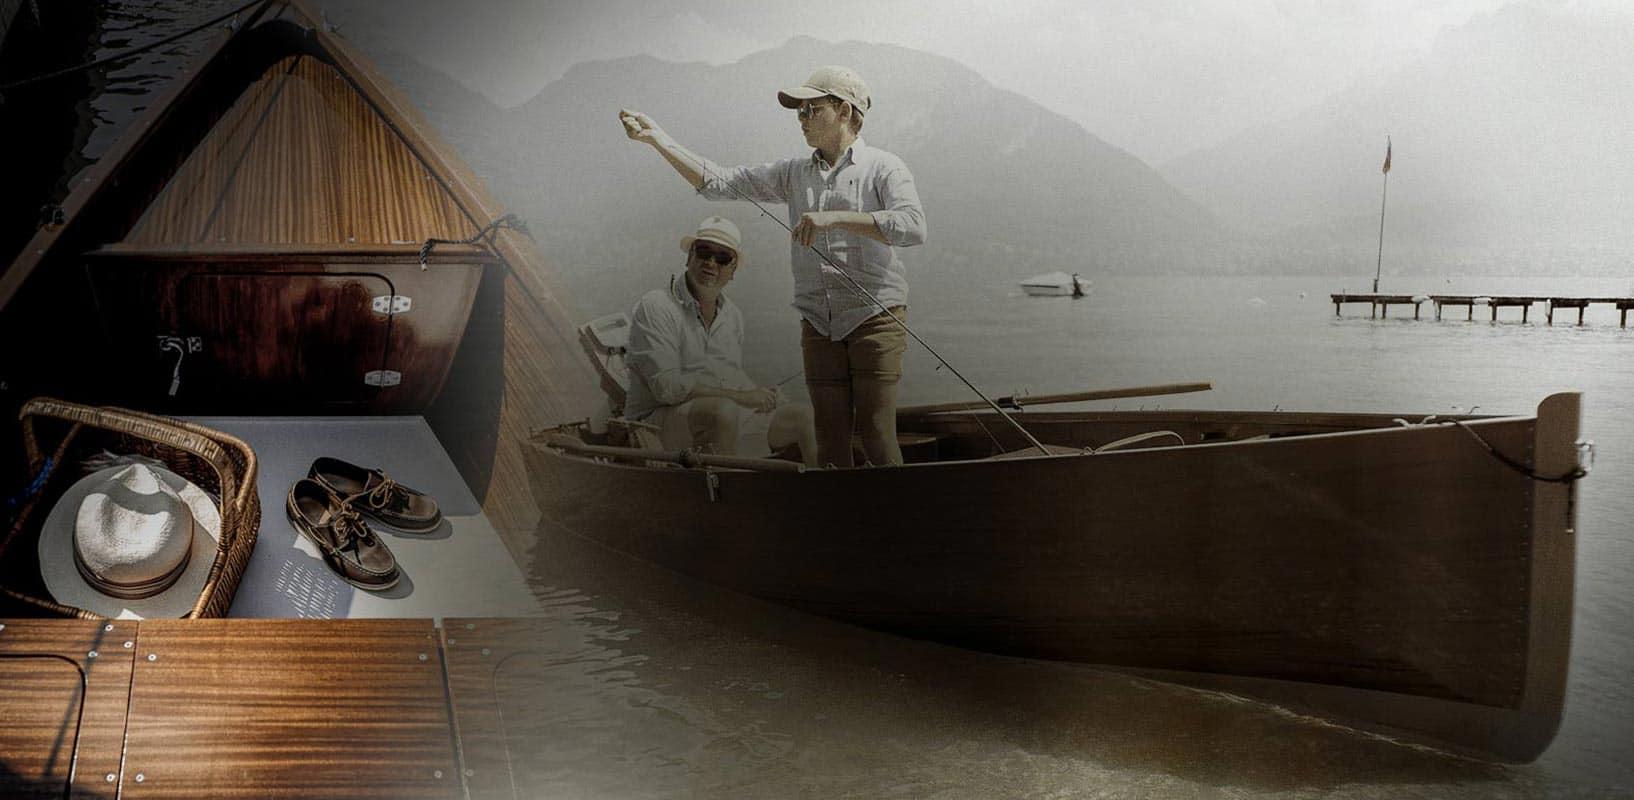 spritz-barque-en-bois-ancienne-chantier-naval-des-savoie